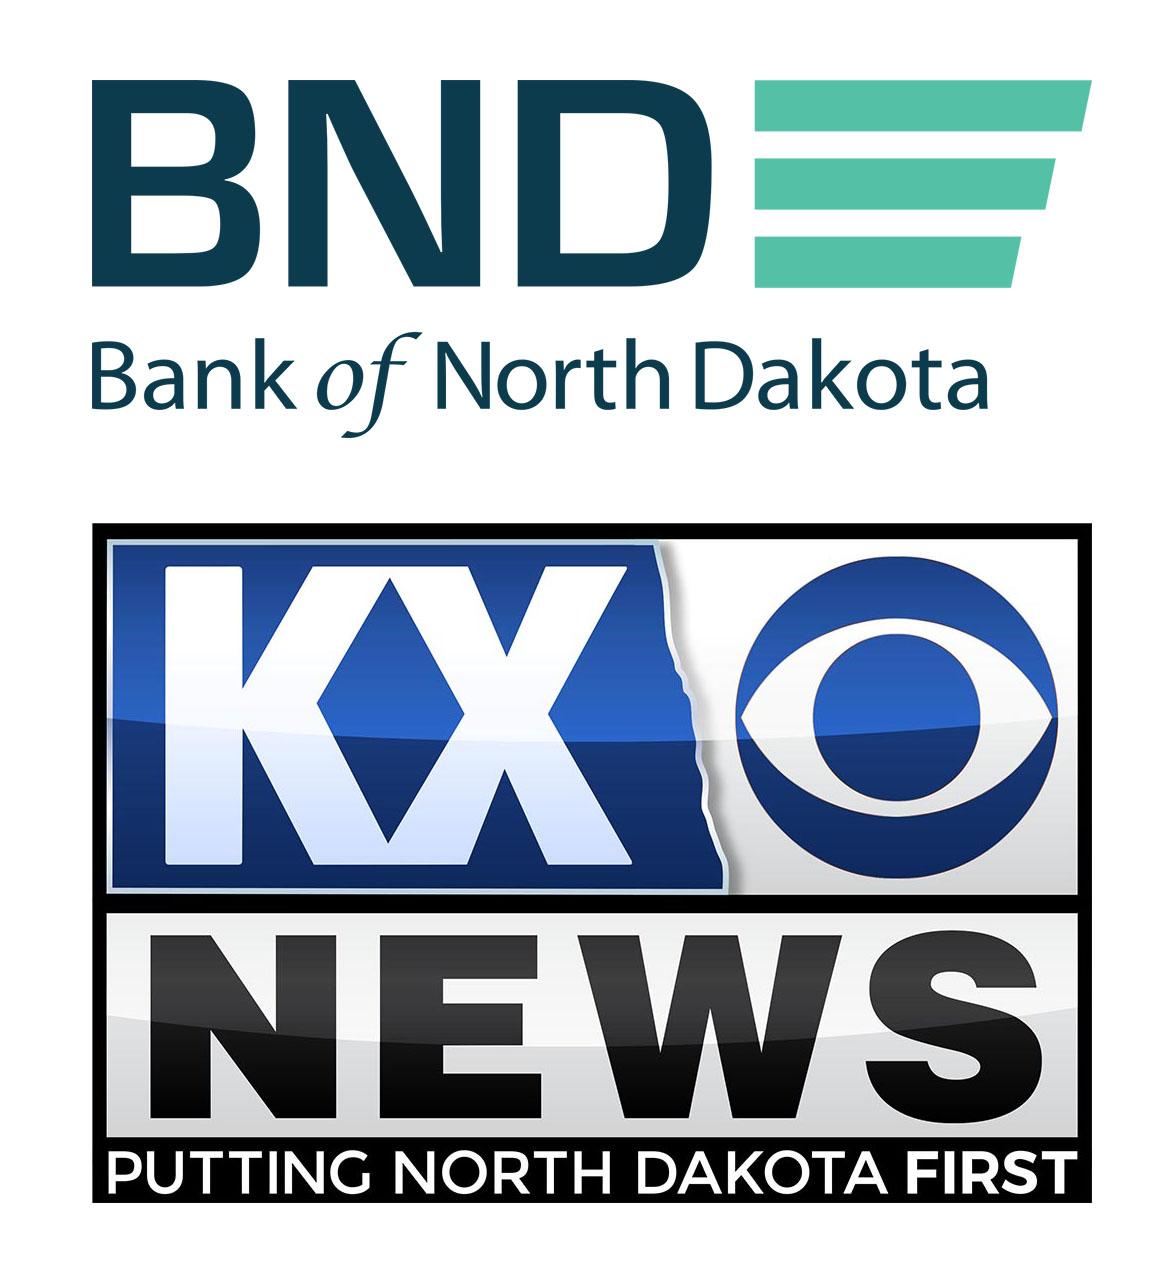 bnd-kx-logos.jpg